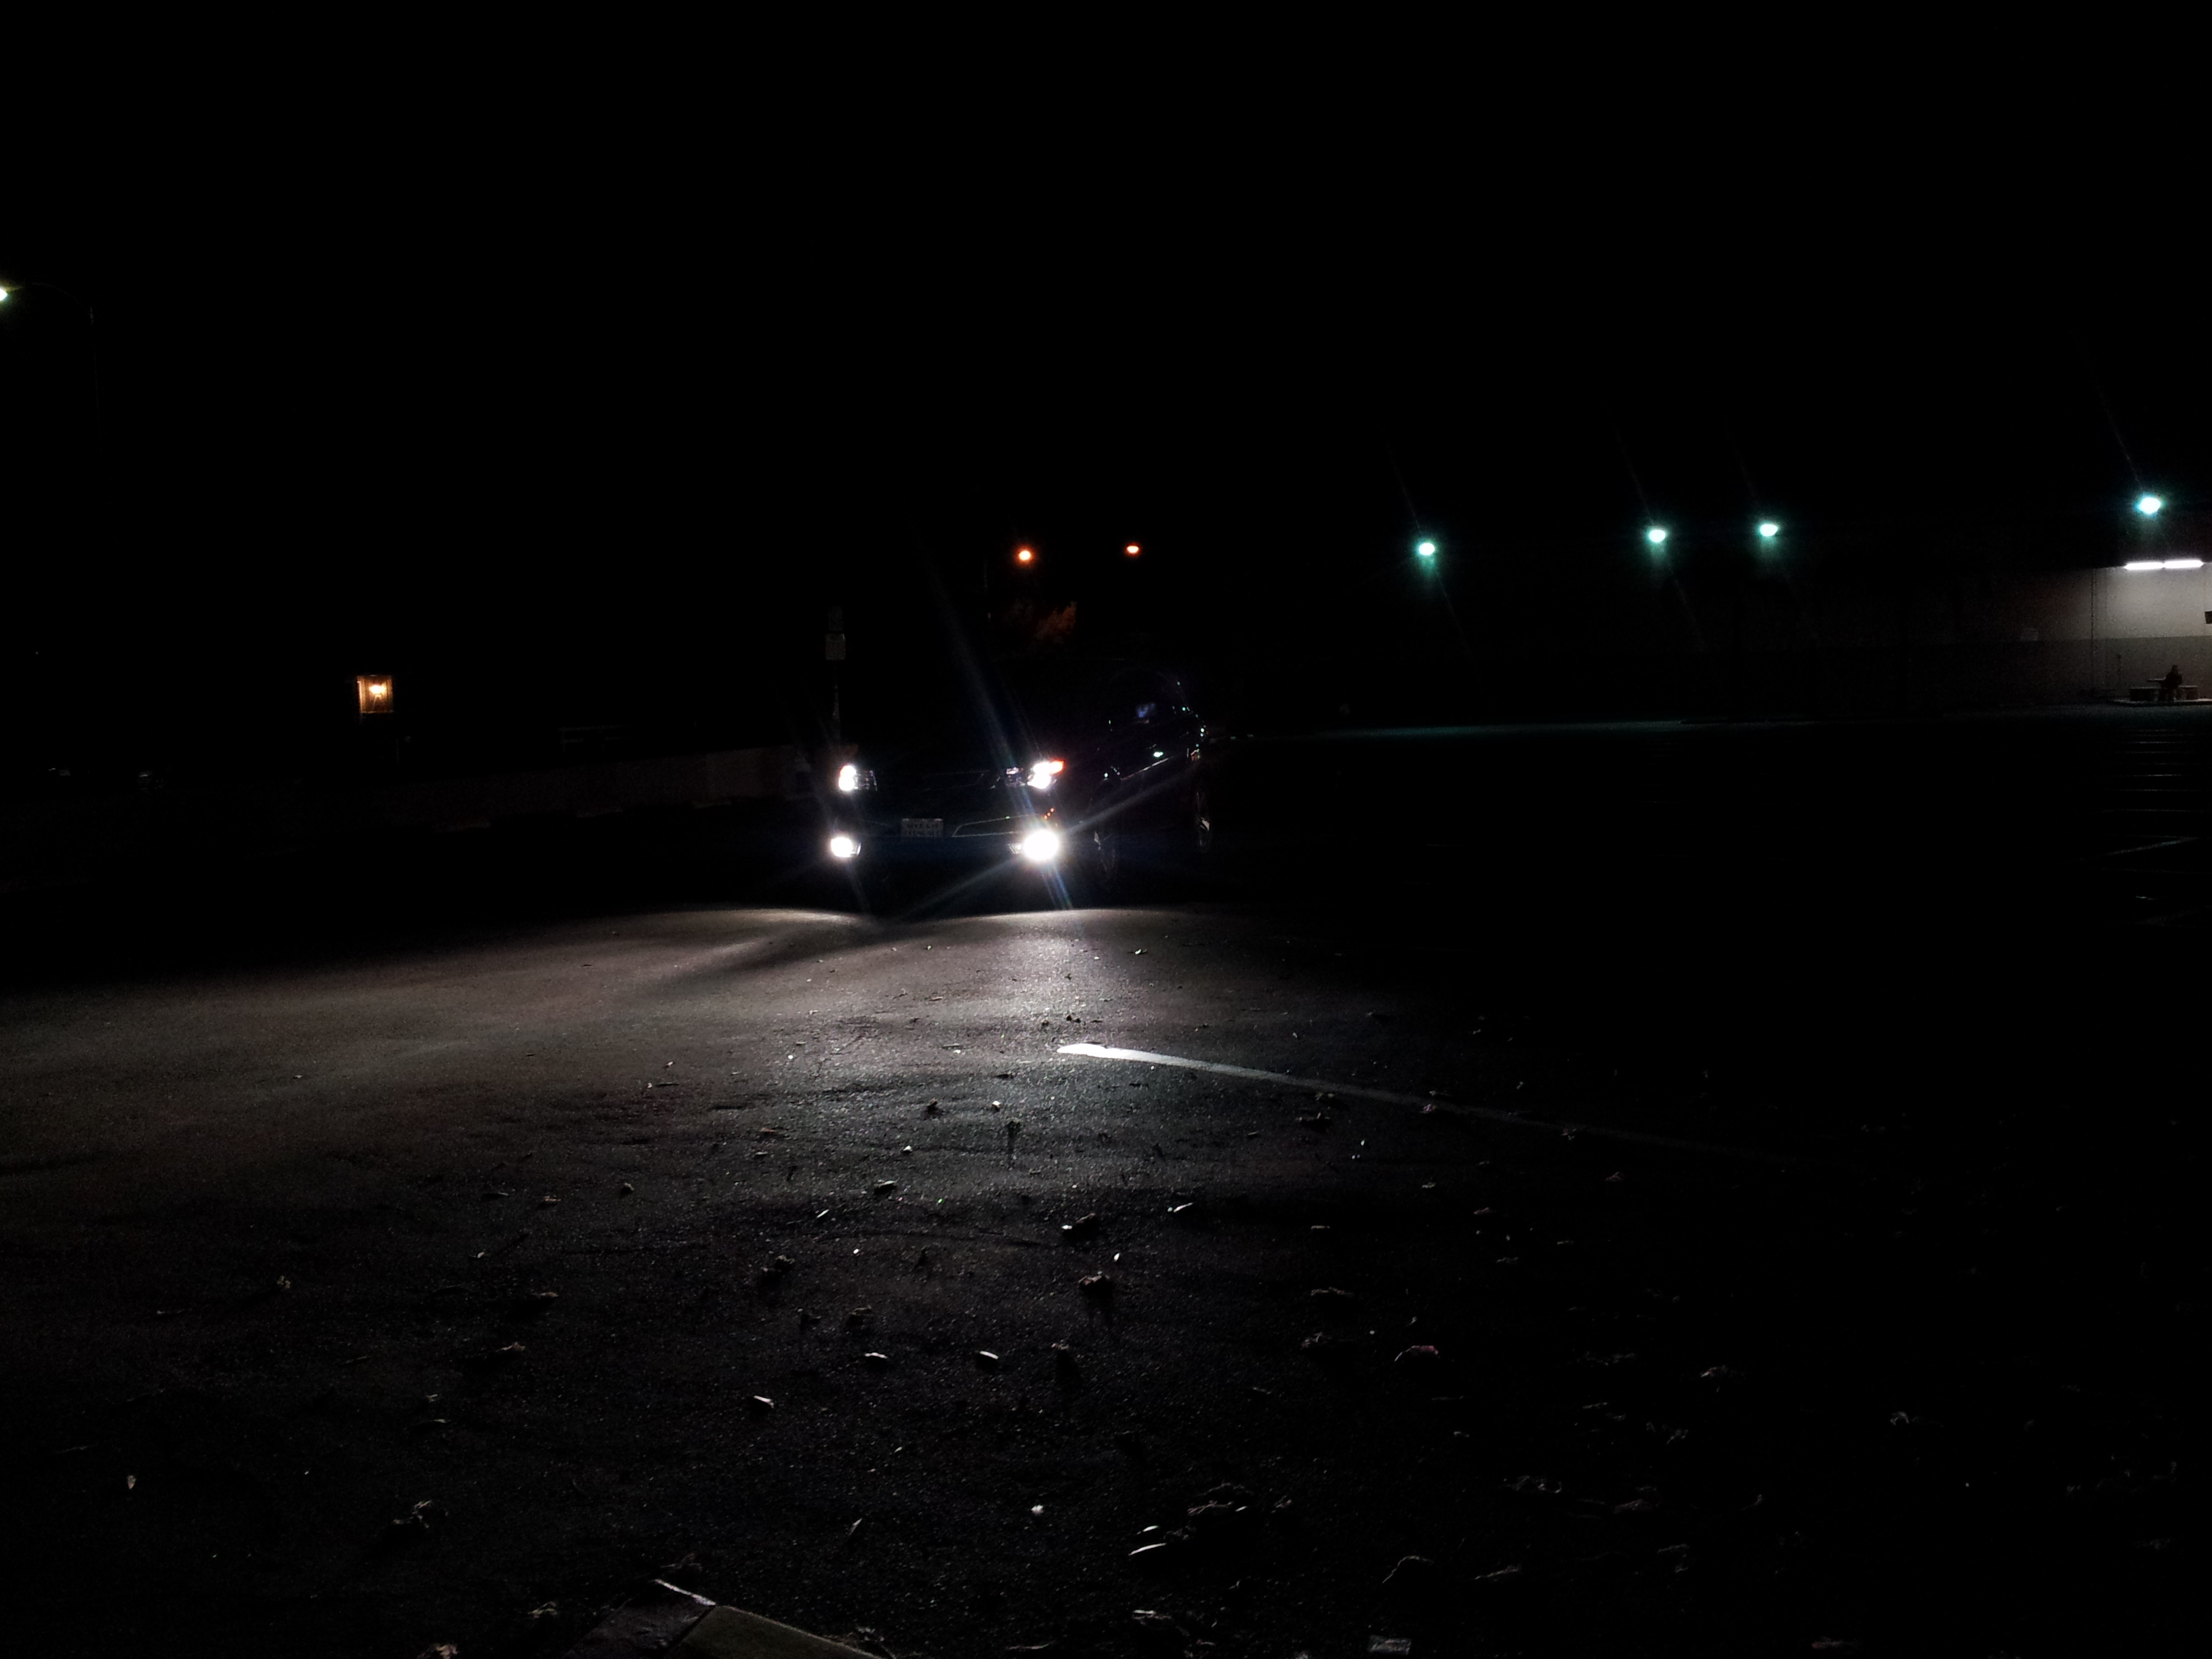 HID Fog/LED DRL Installed - PICS-20121025_214540.jpg